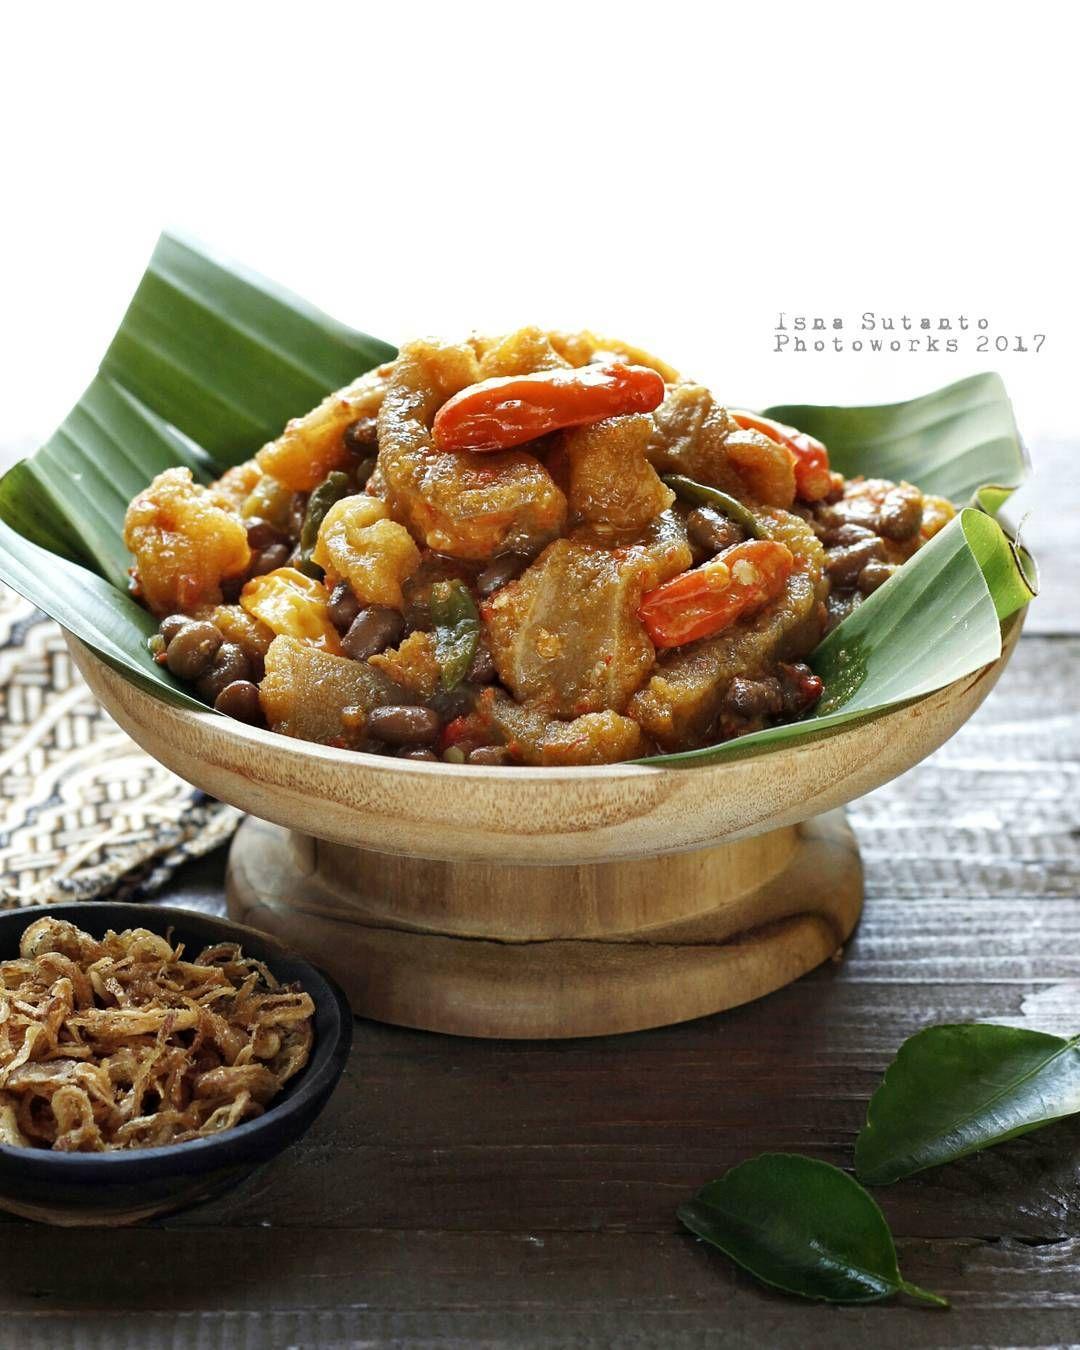 121 Likes 5 Comments Isna Sutanto Isnasutanto On Instagram Met Siaaaang Alhamdulillah Jumat Barokah Share Res Food Food And Drink Healty Food